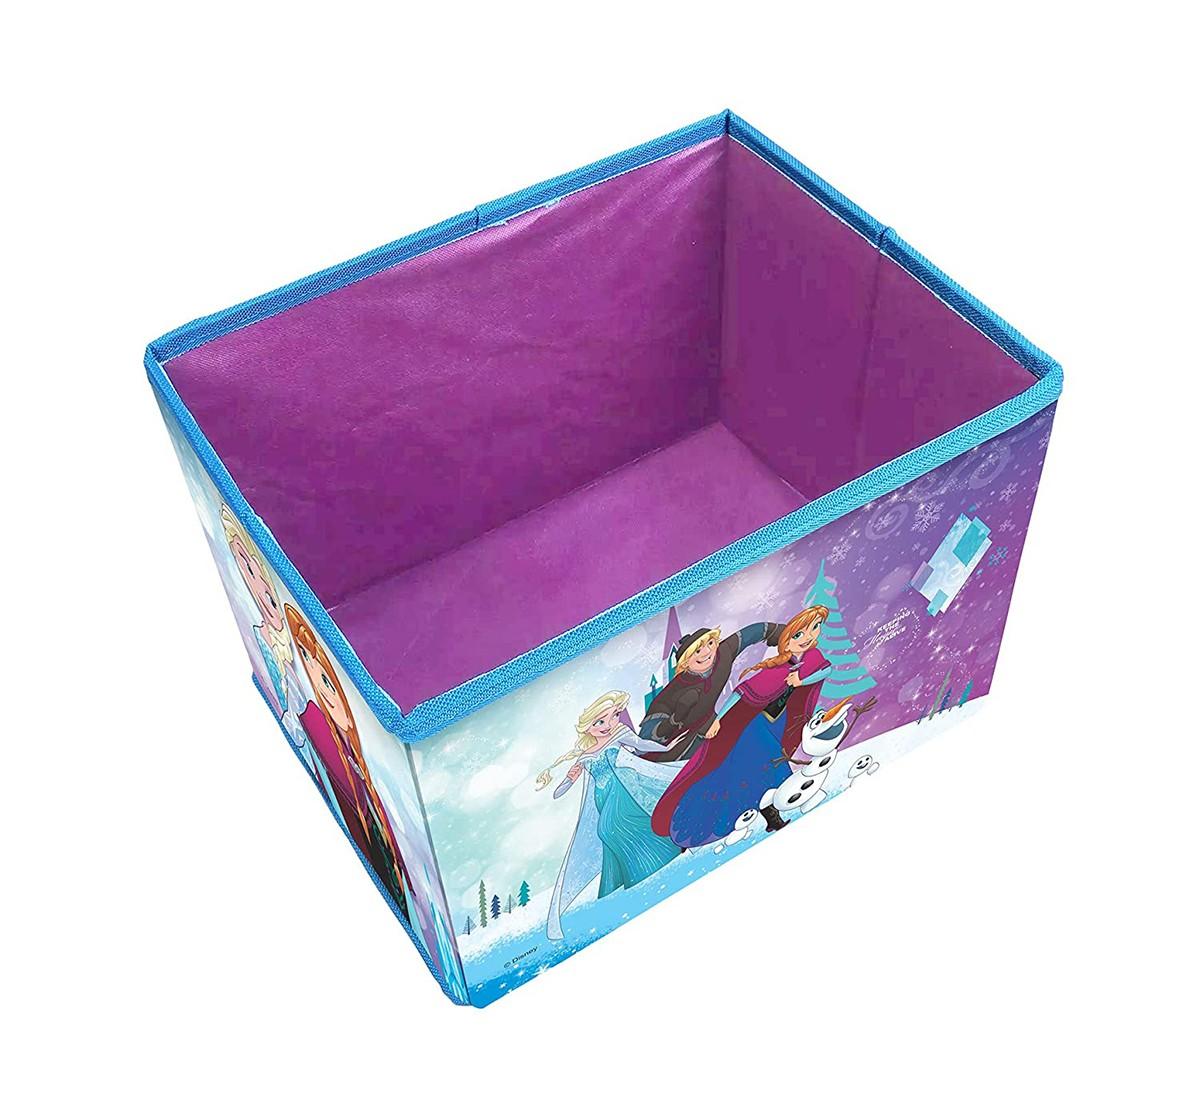 Disney Frozen Toy Storage Box for Kids age 3Y+